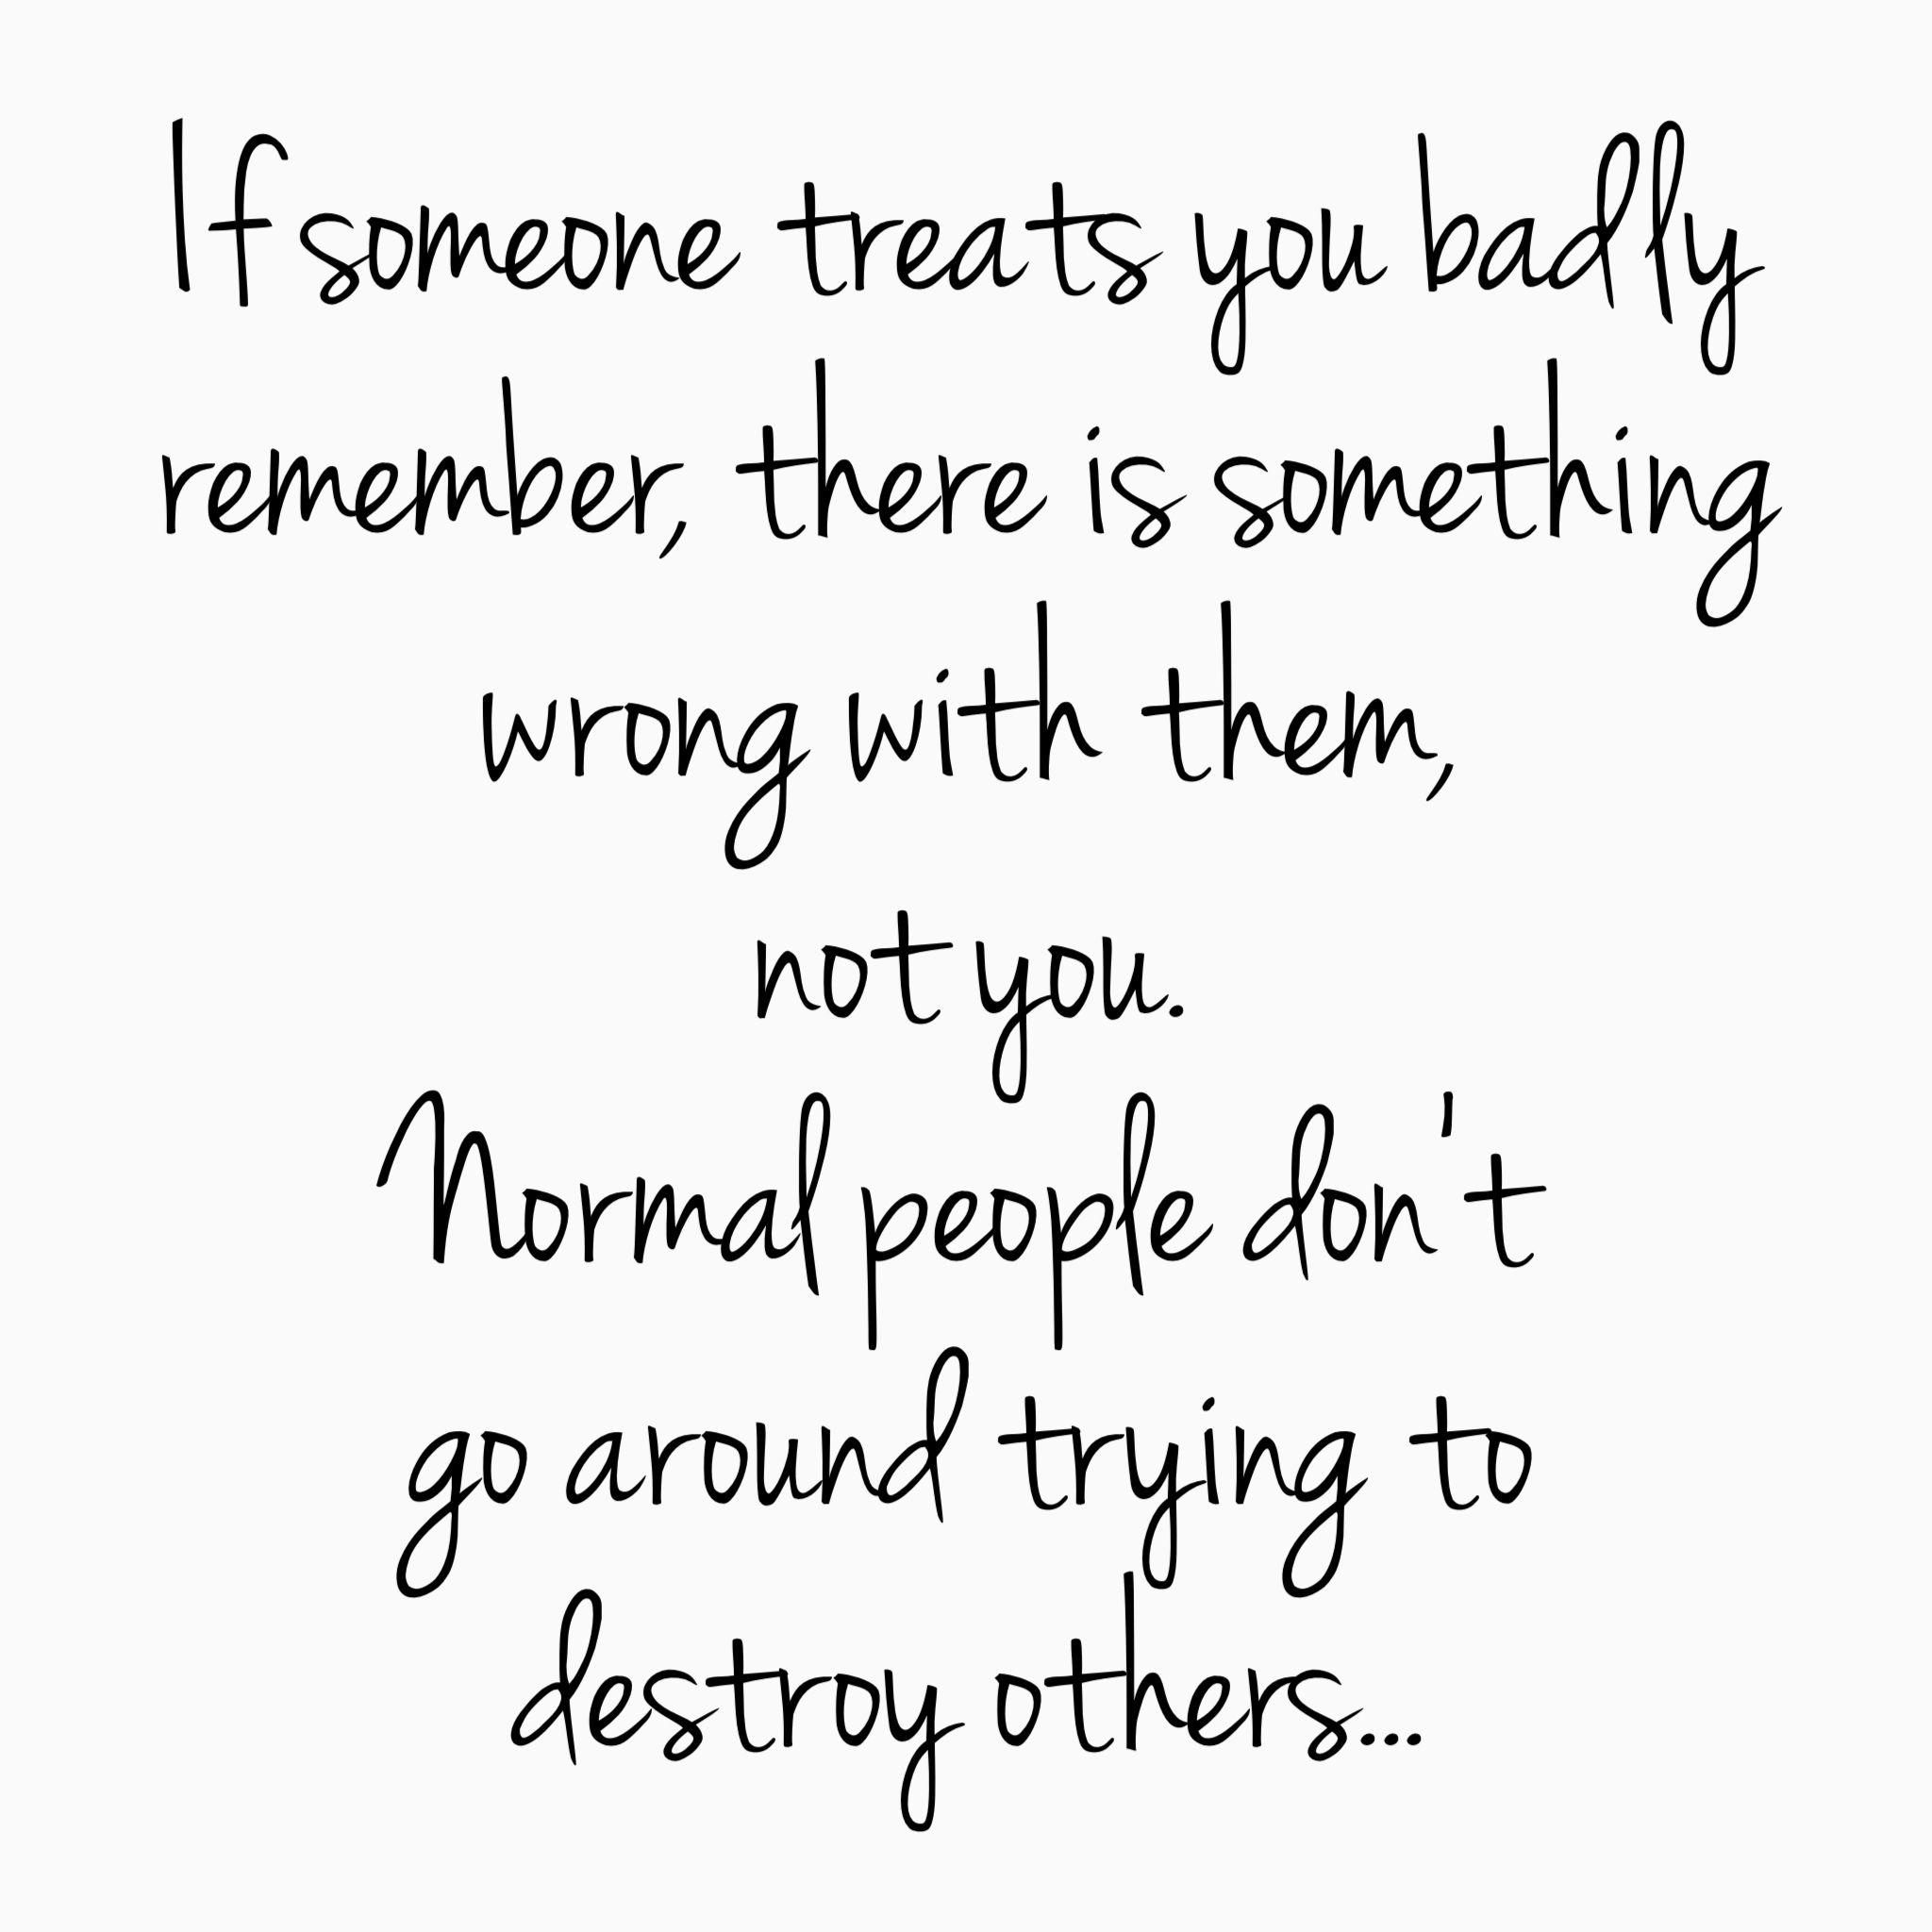 Loving someone who treats you bad